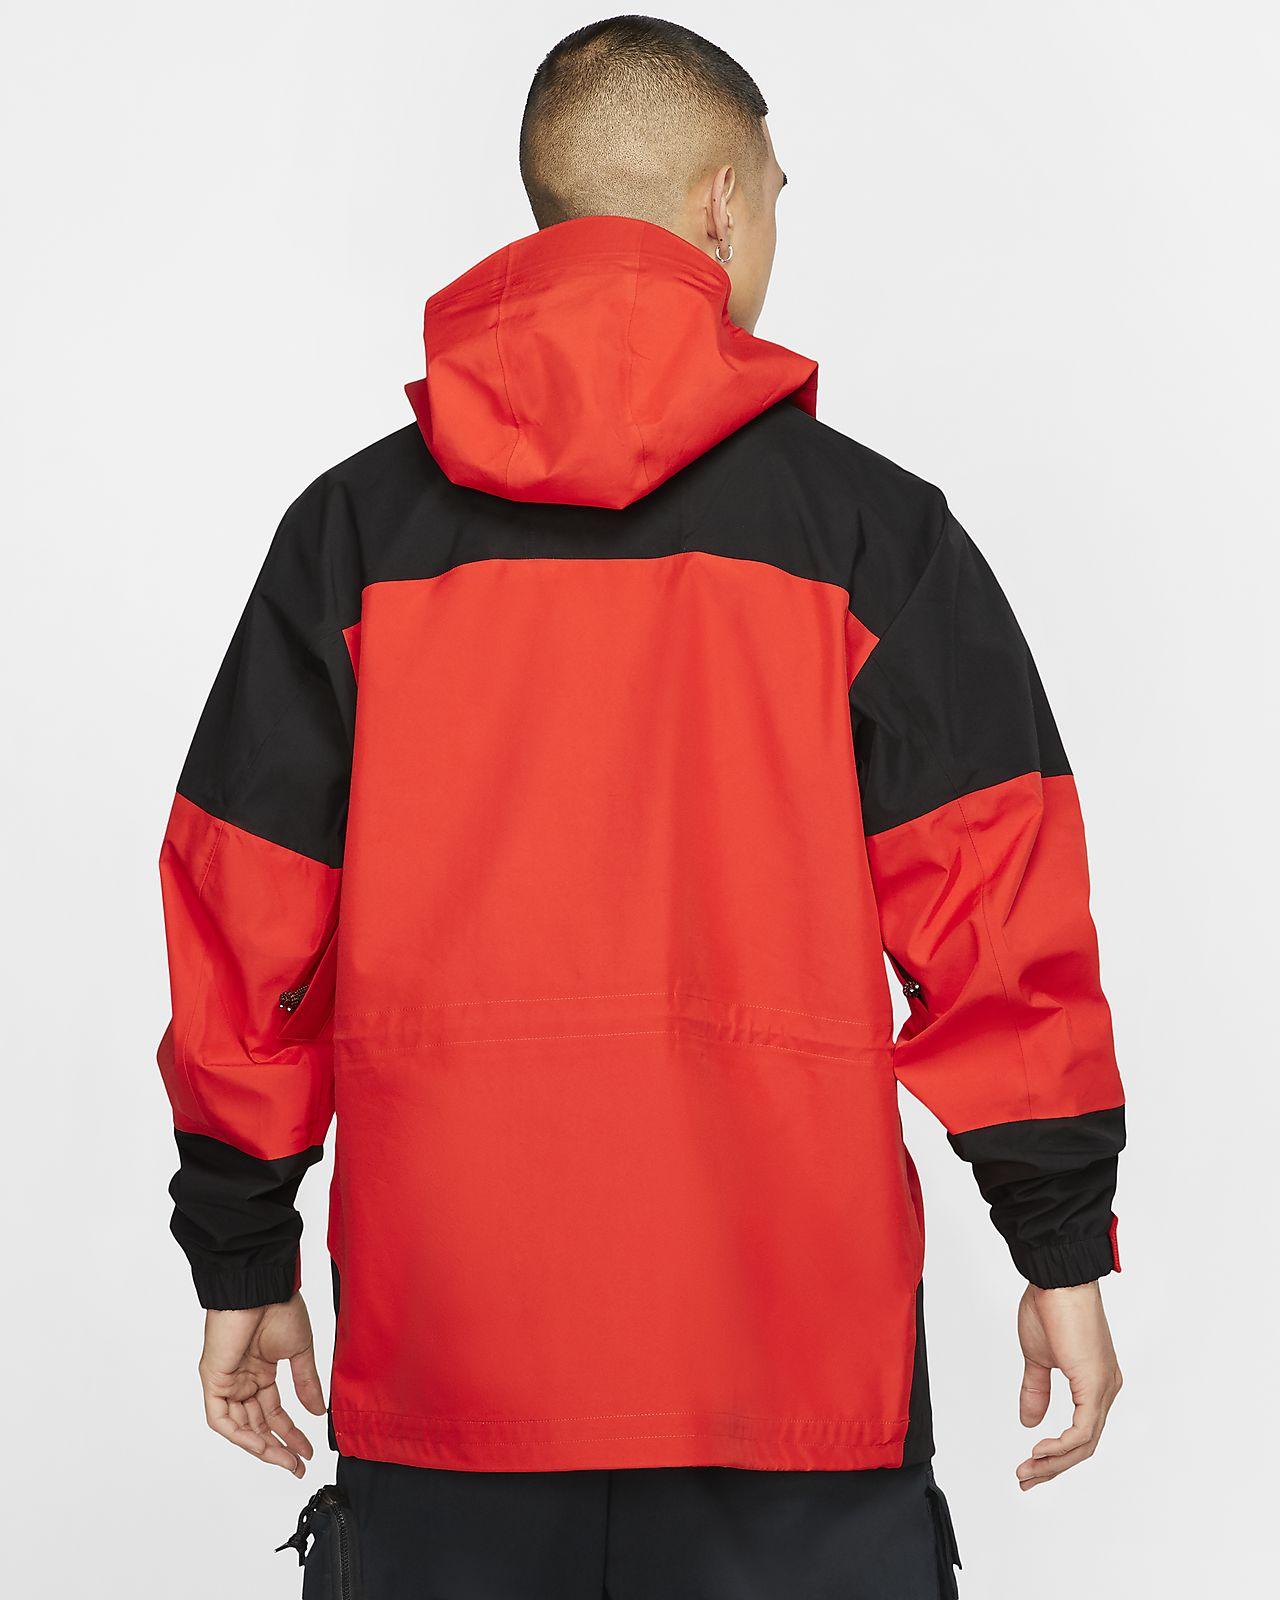 Nike ACG GORE TEX Men's Jacket